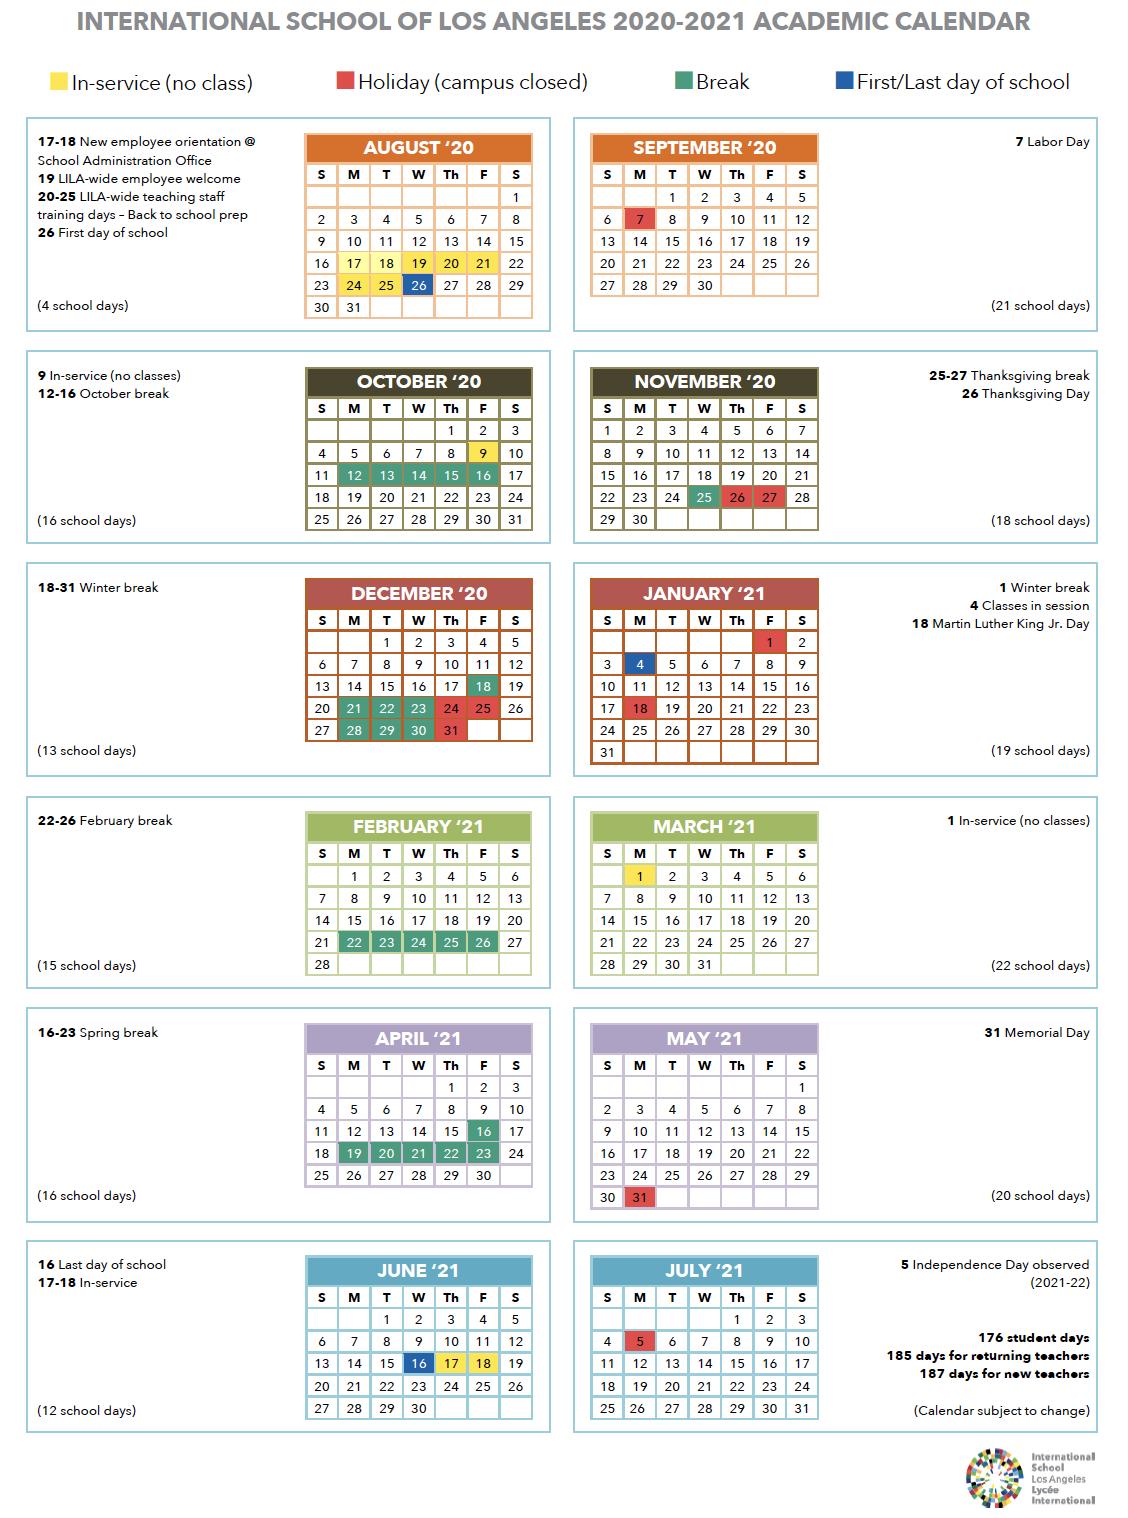 Calendar | International School Of Los Angeles With University Of Southern California School Calendar 2021 2020